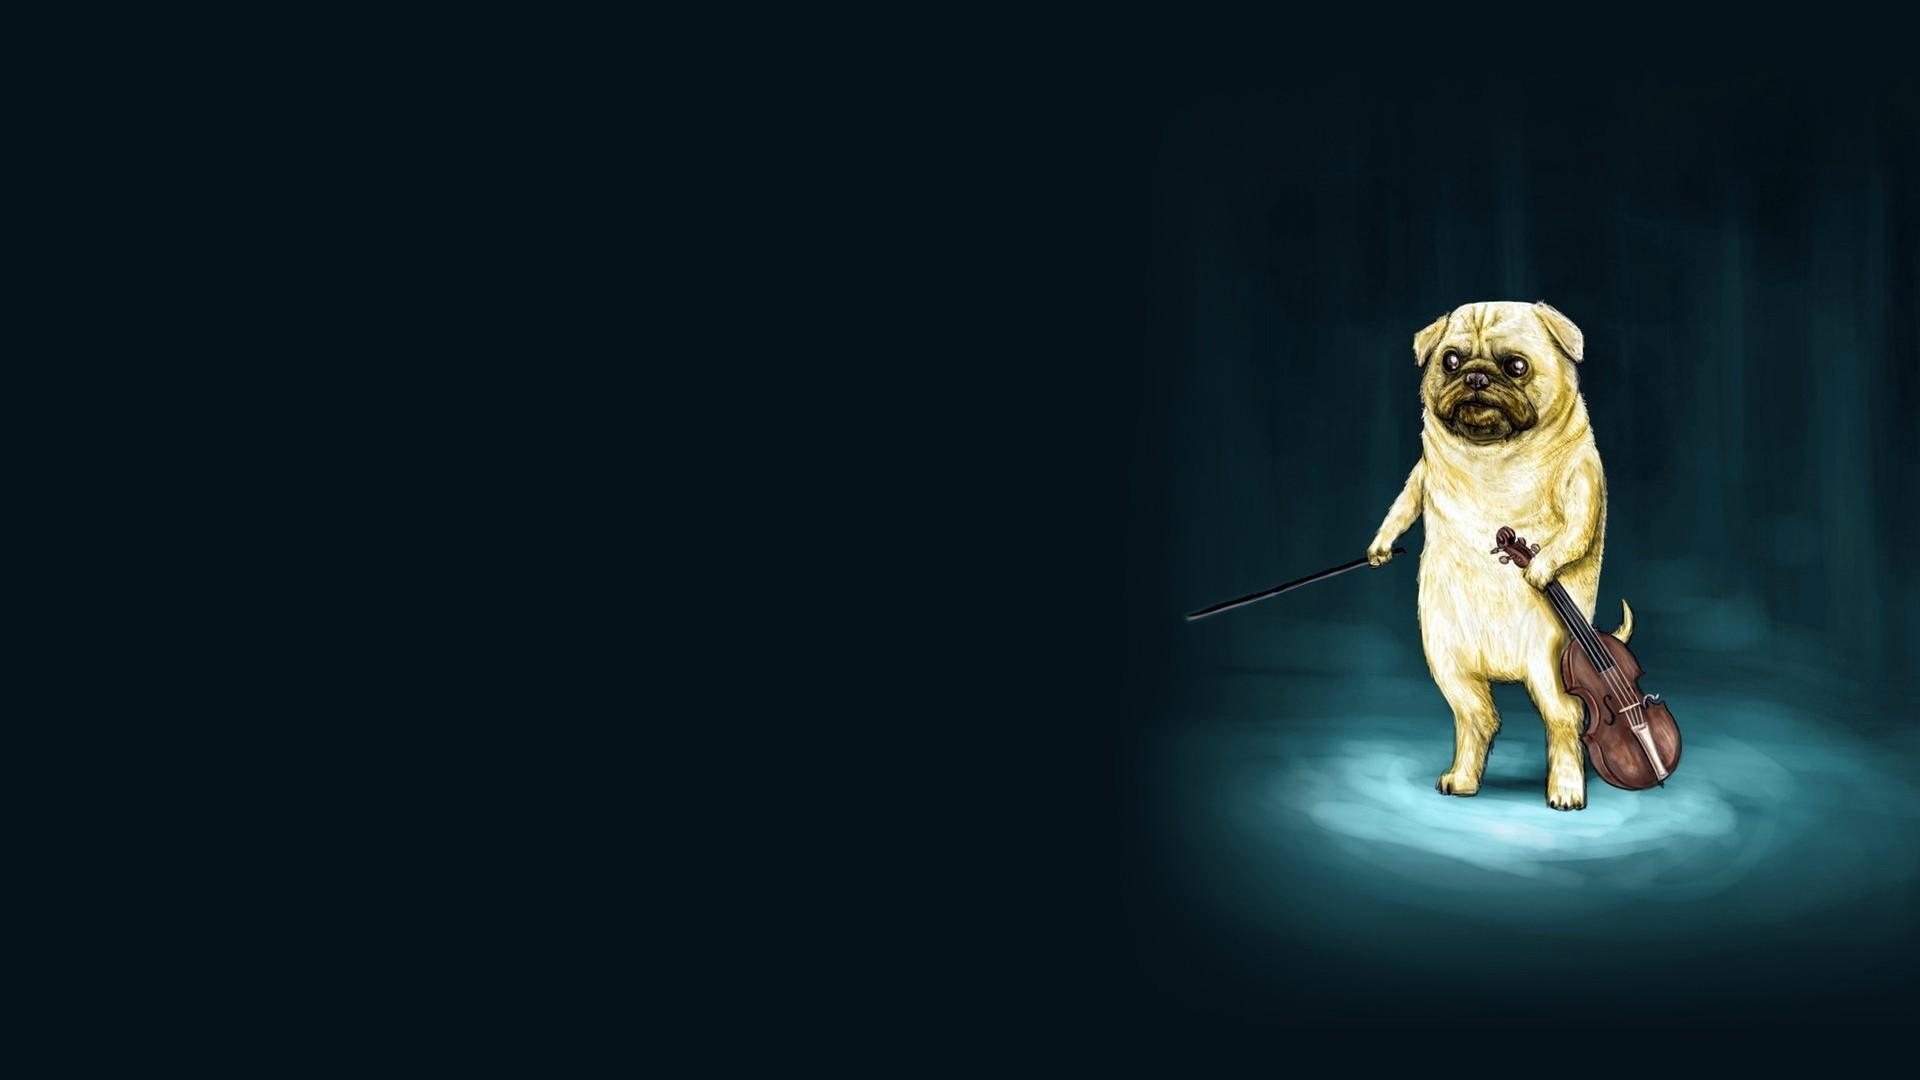 Pug Playing the Violin – Wallpapers